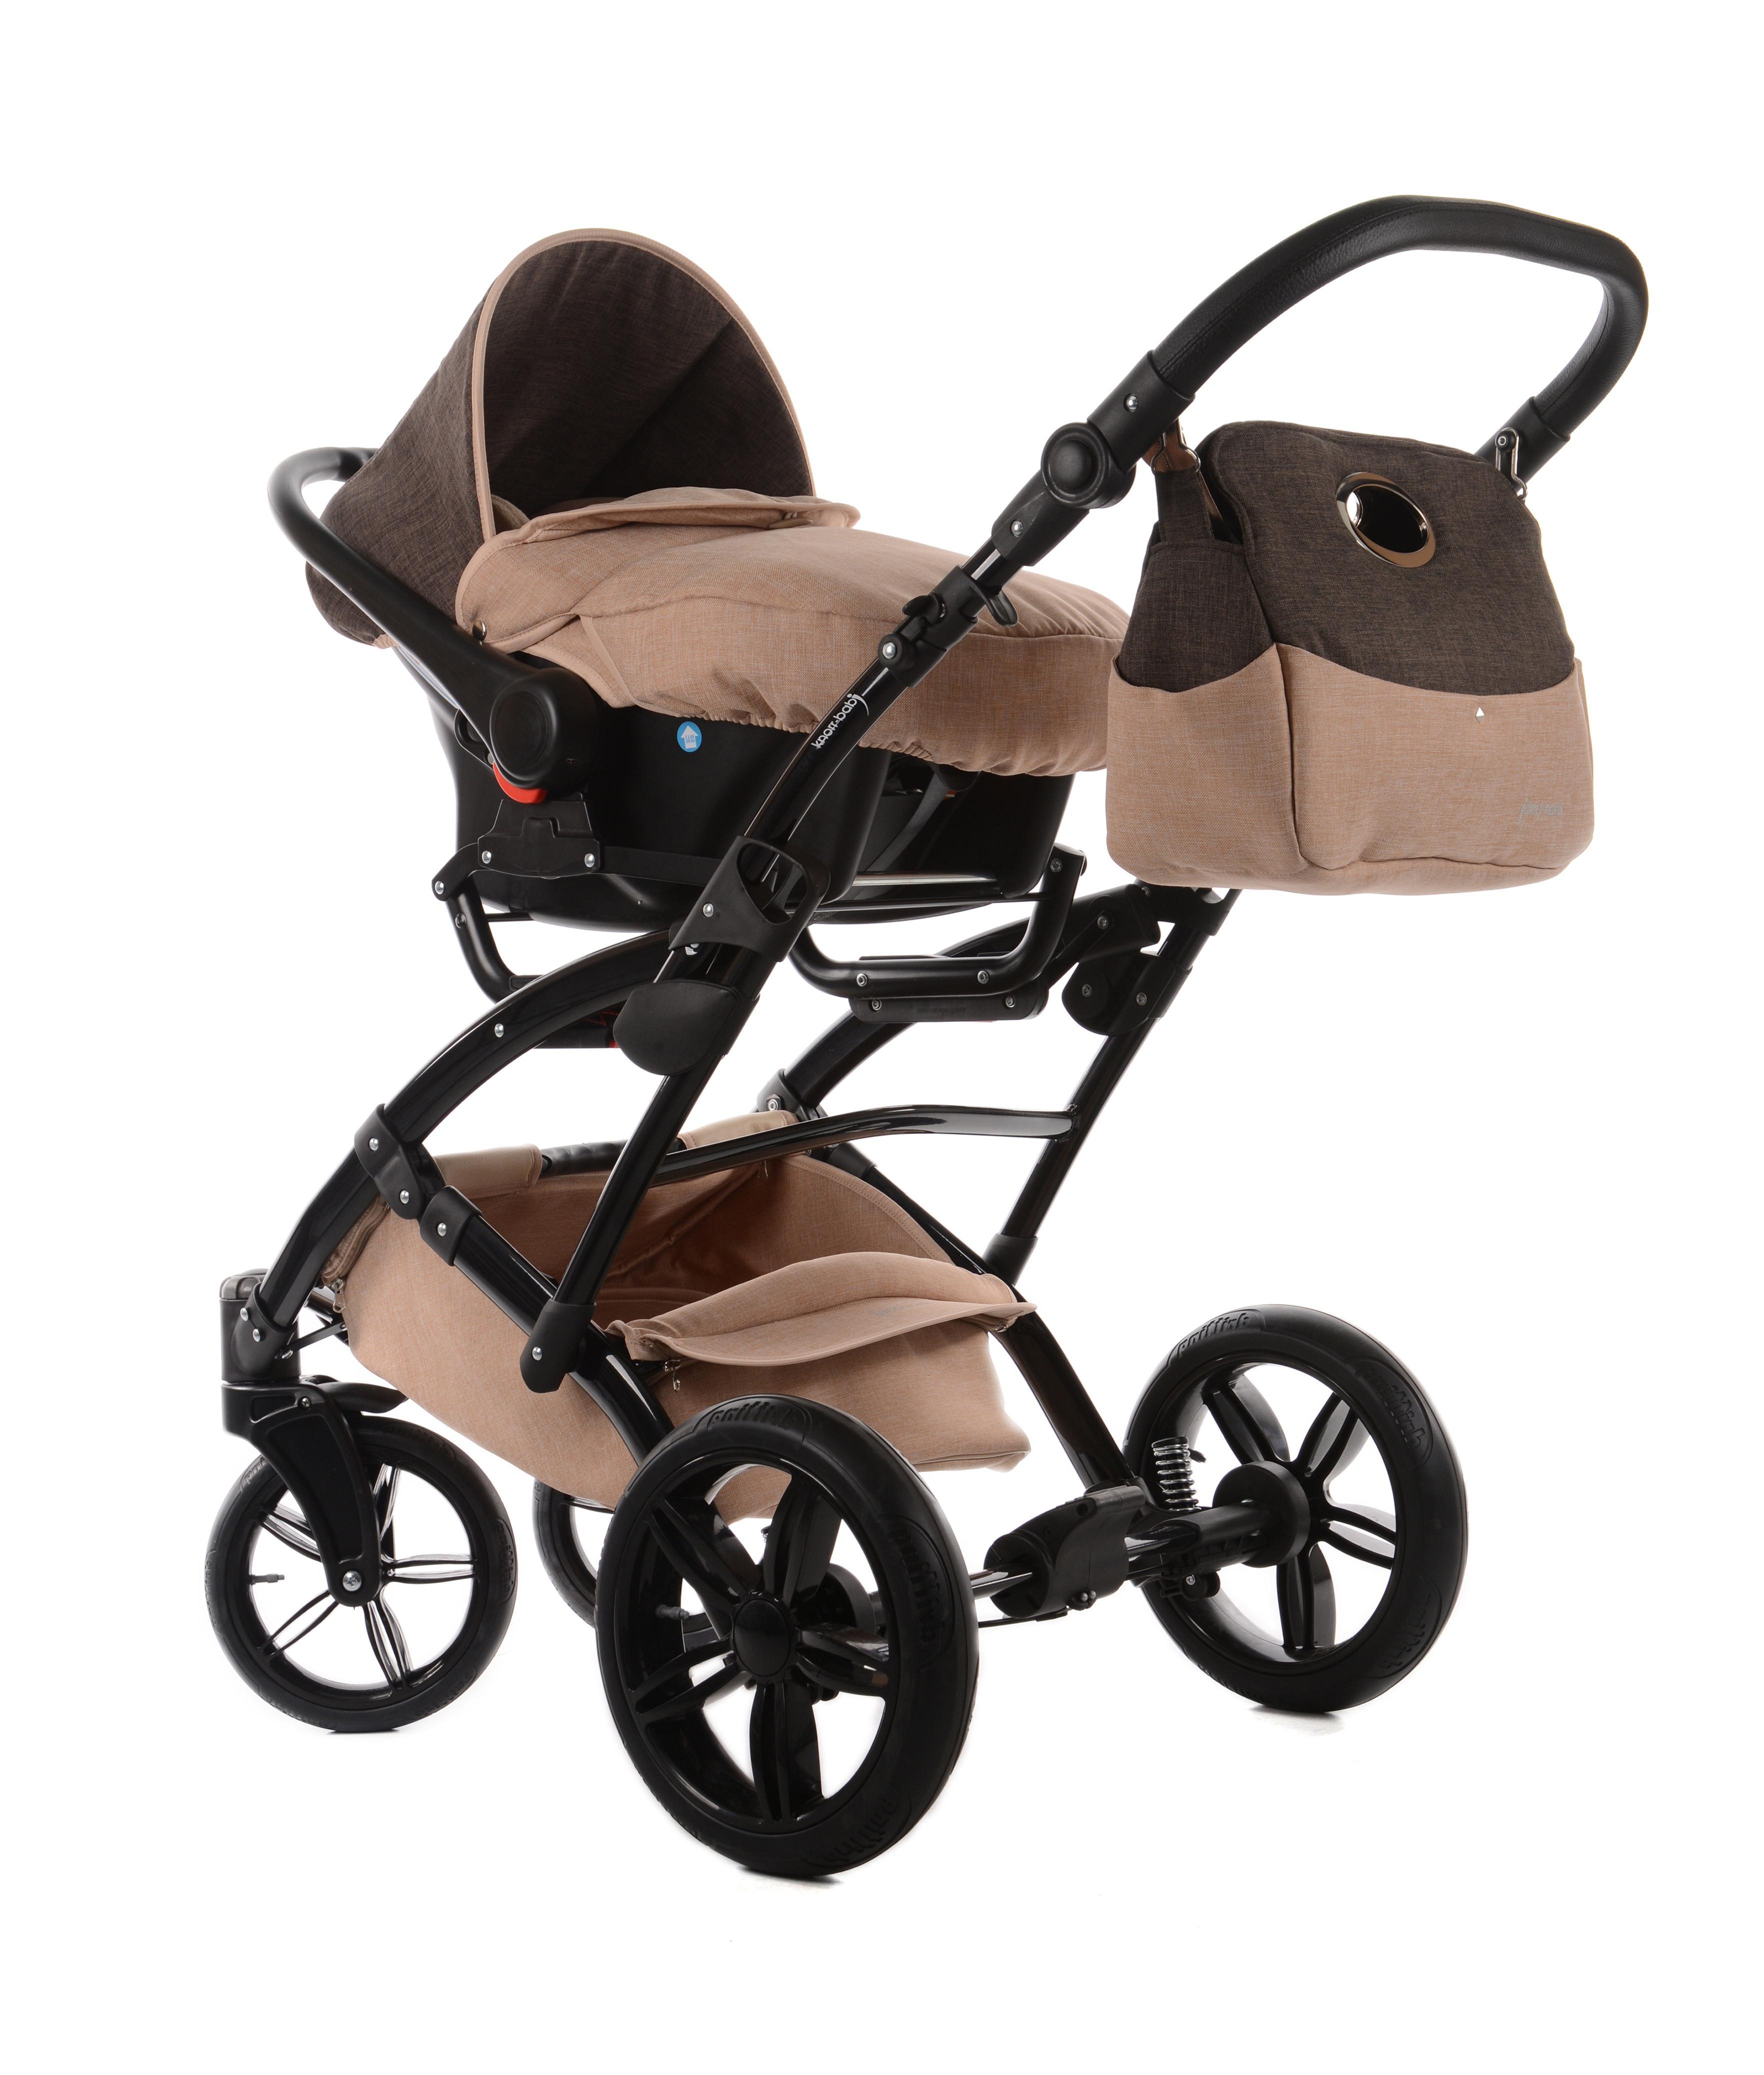 knorr baby 3312 2 voletto set 3 in 1 braun baby. Black Bedroom Furniture Sets. Home Design Ideas